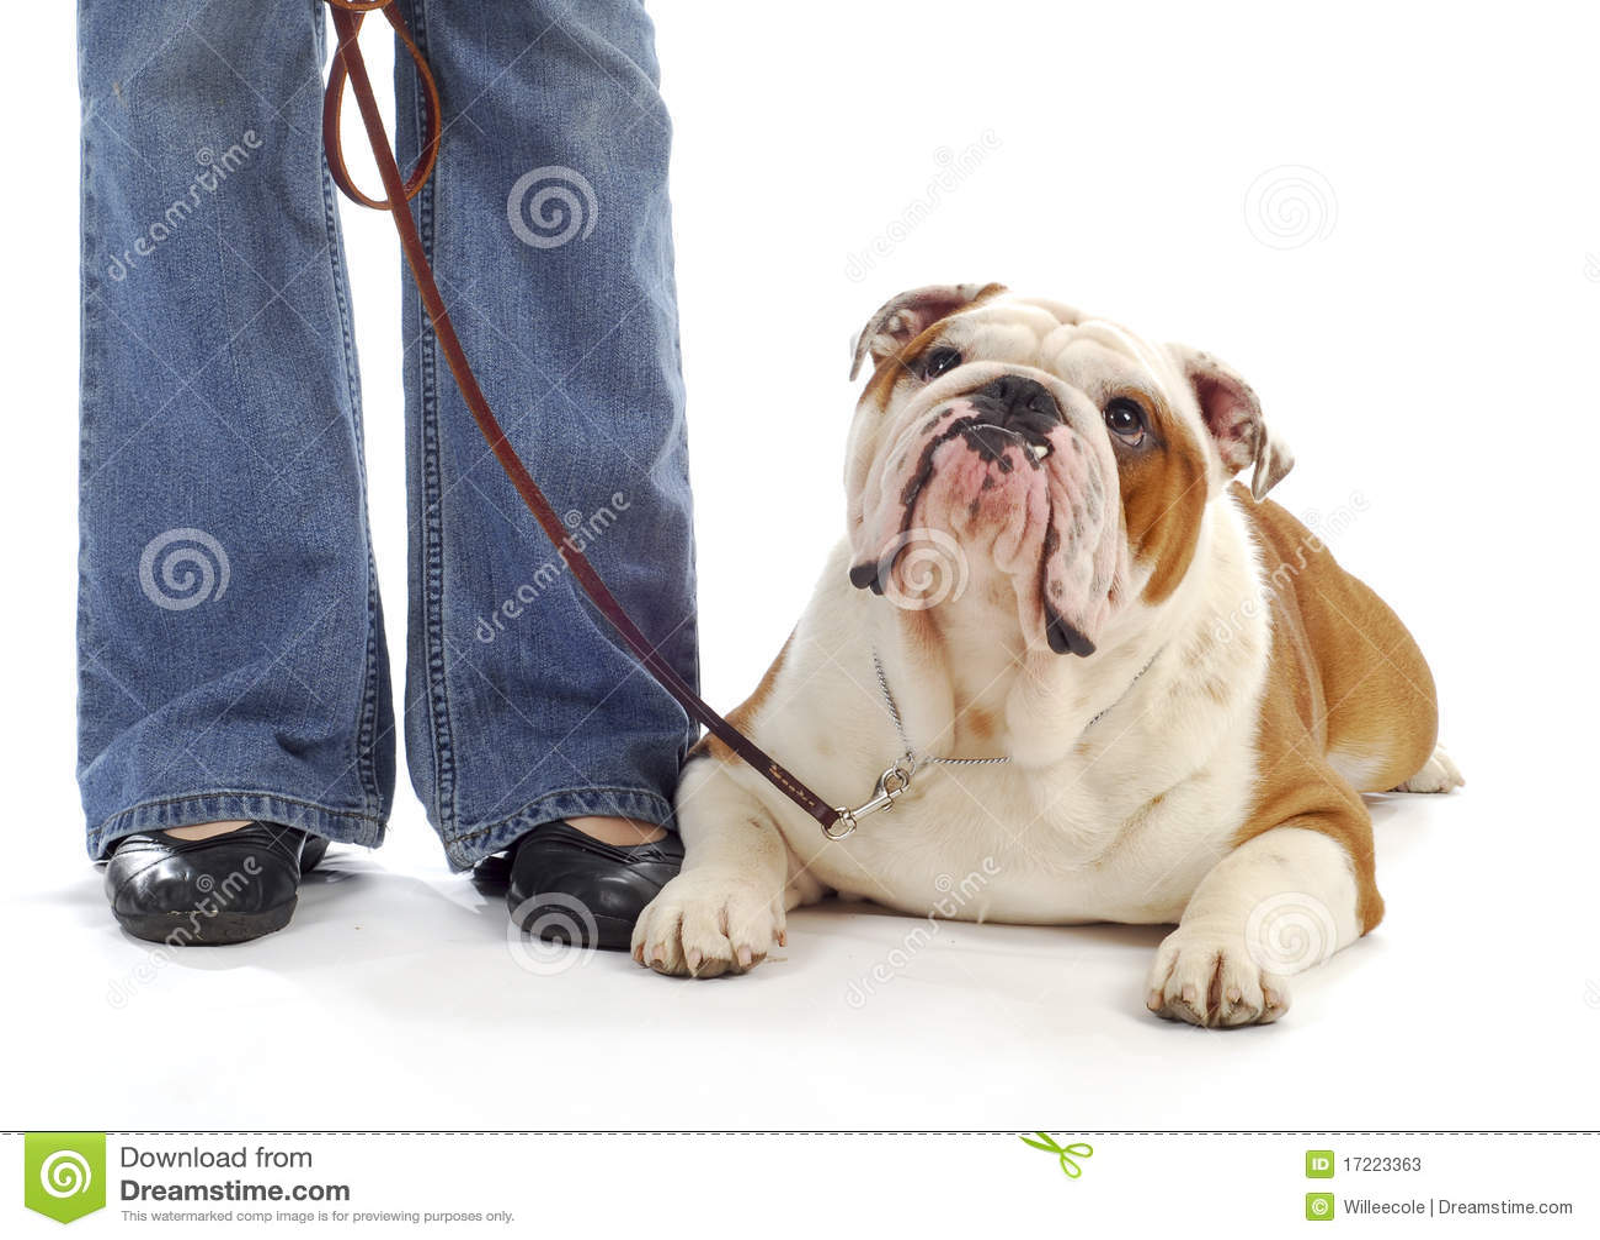 help bet365 bet365 jobs festival park Dog Obedience Training